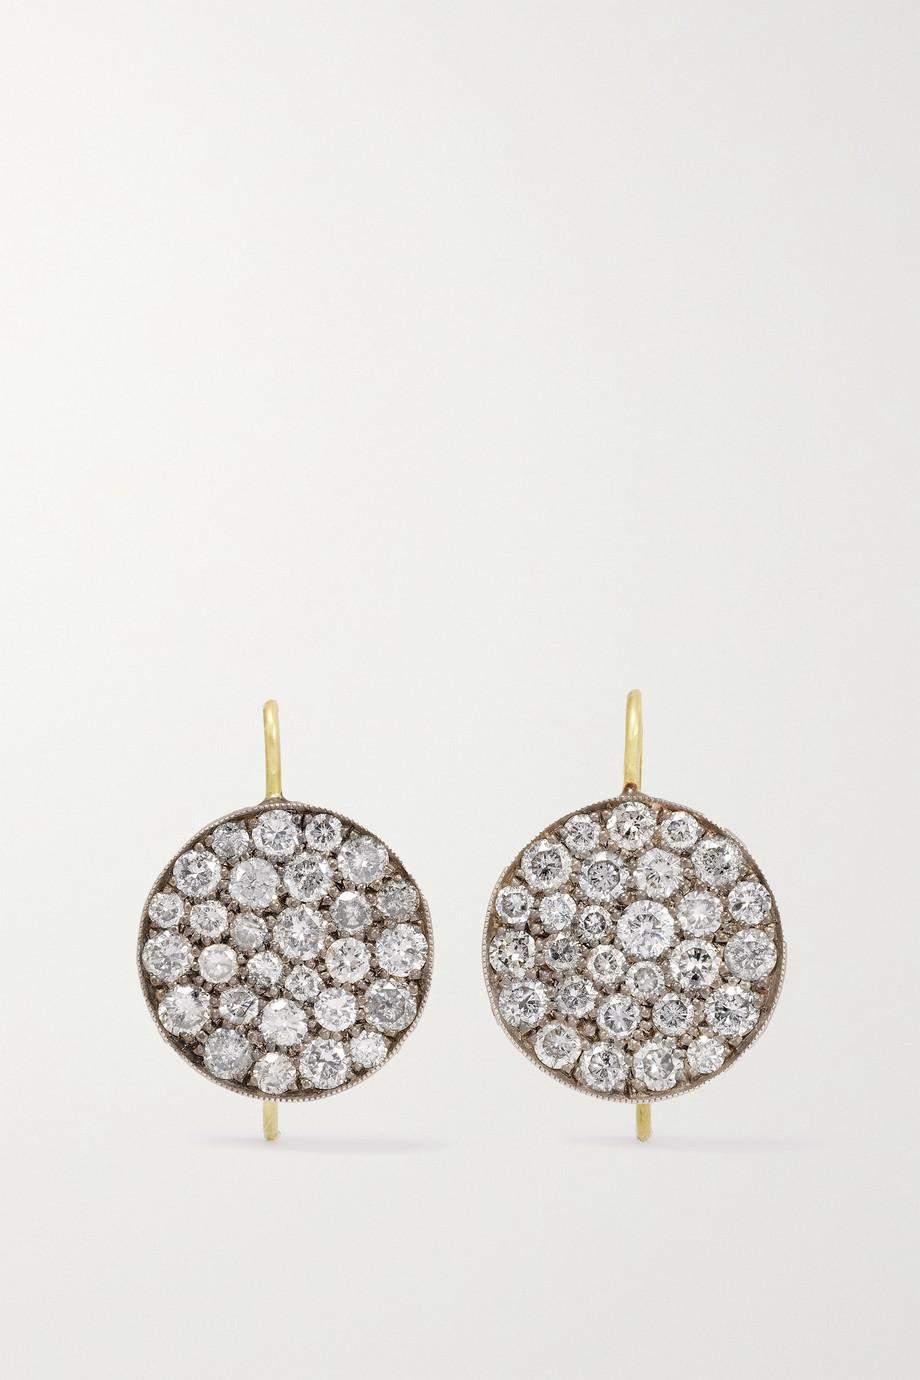 Sylva & Cie Ten Table 18-karat gold and sterling silver diamond earrings